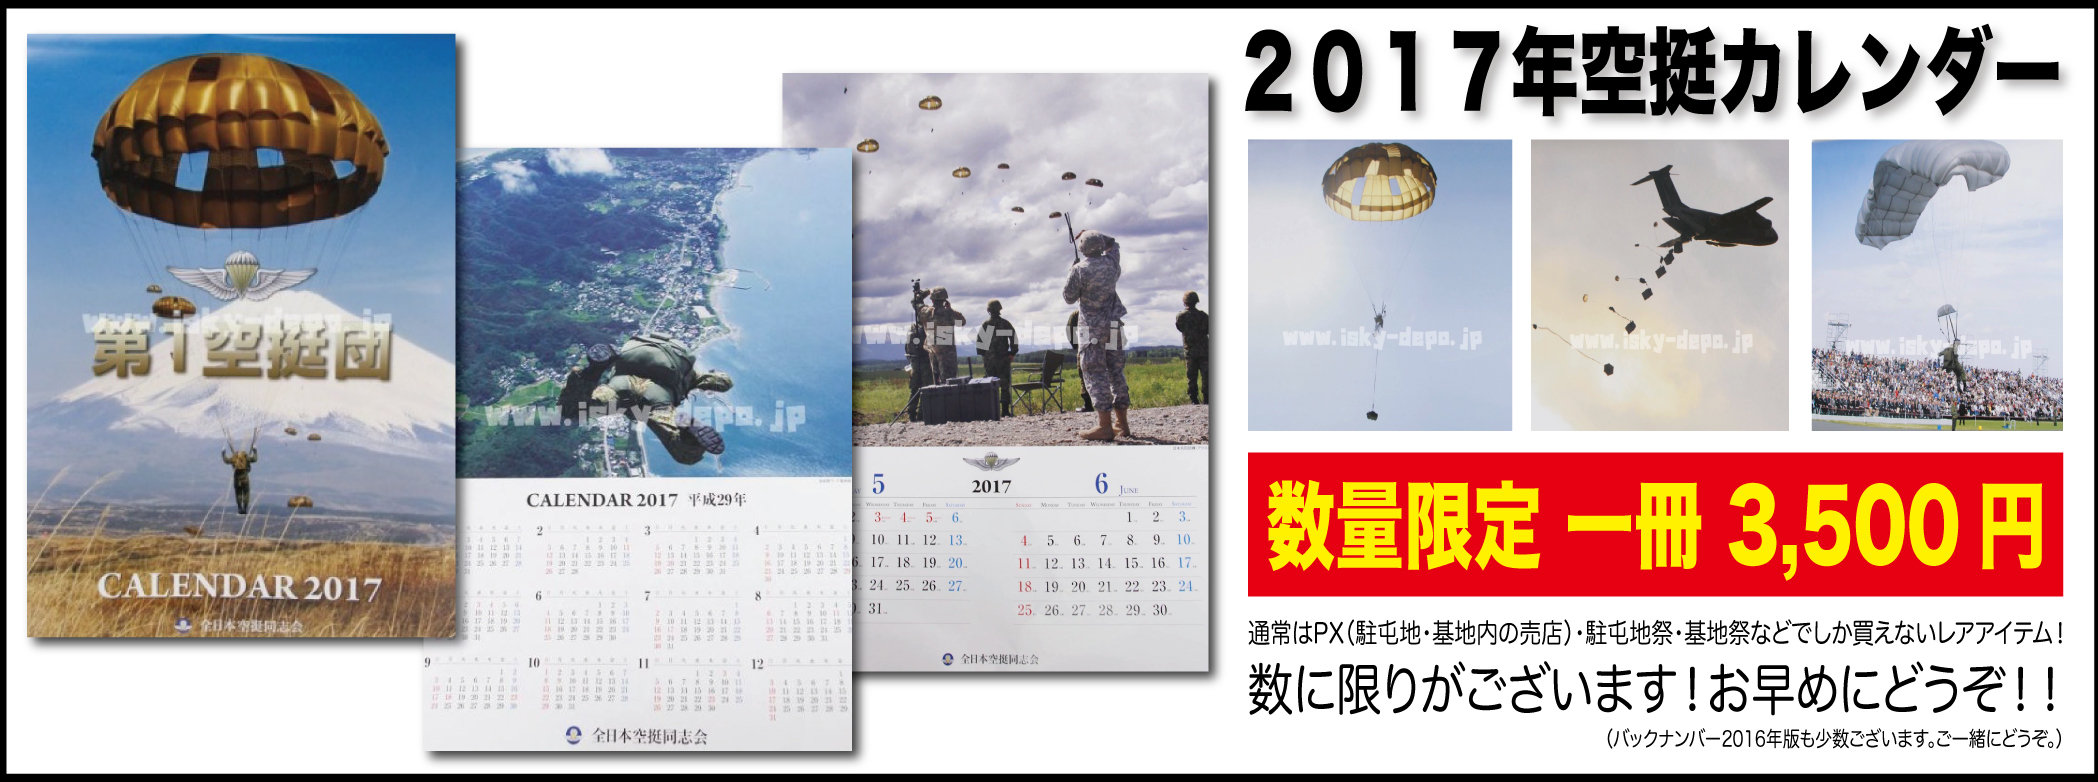 ISKY.DEPO空挺カレンダー2017陸上自衛隊第1空挺団空挺同志会